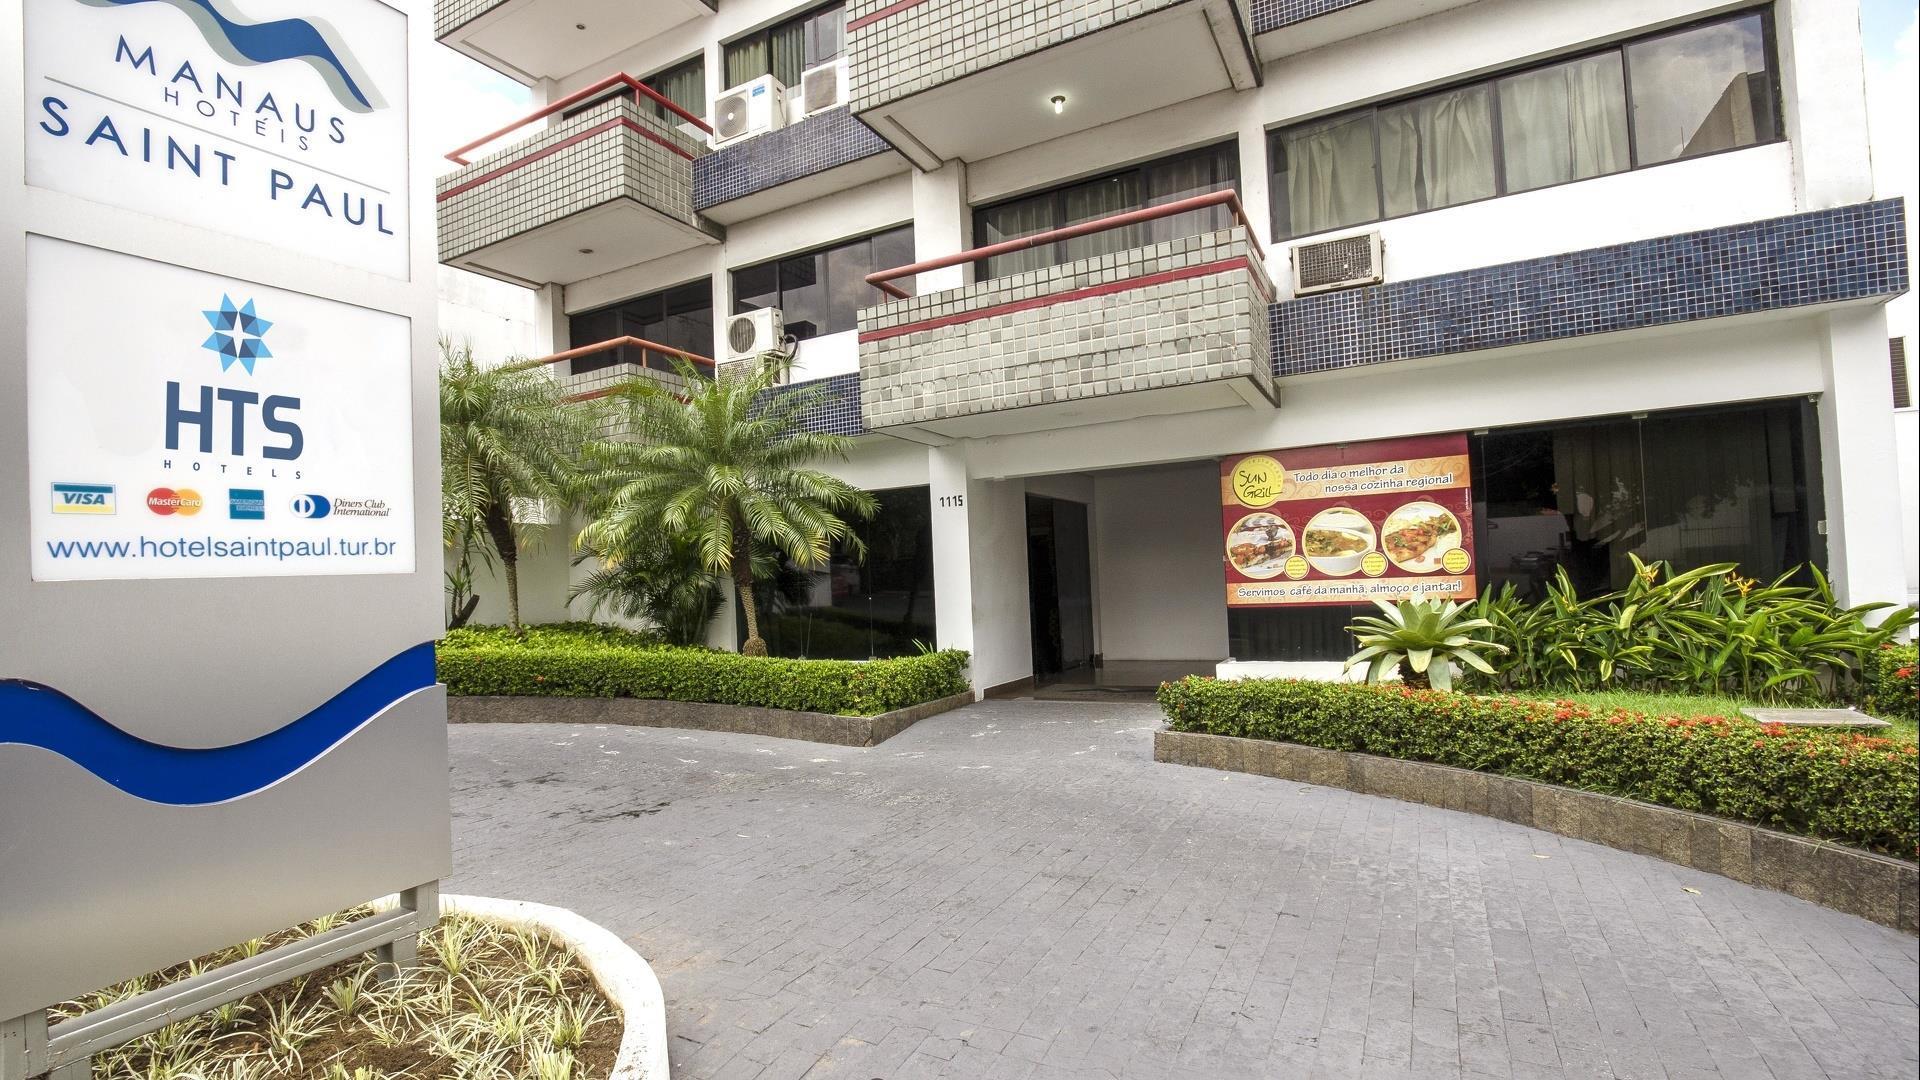 Brazil Manaus: Standard Hotel Saint Paul